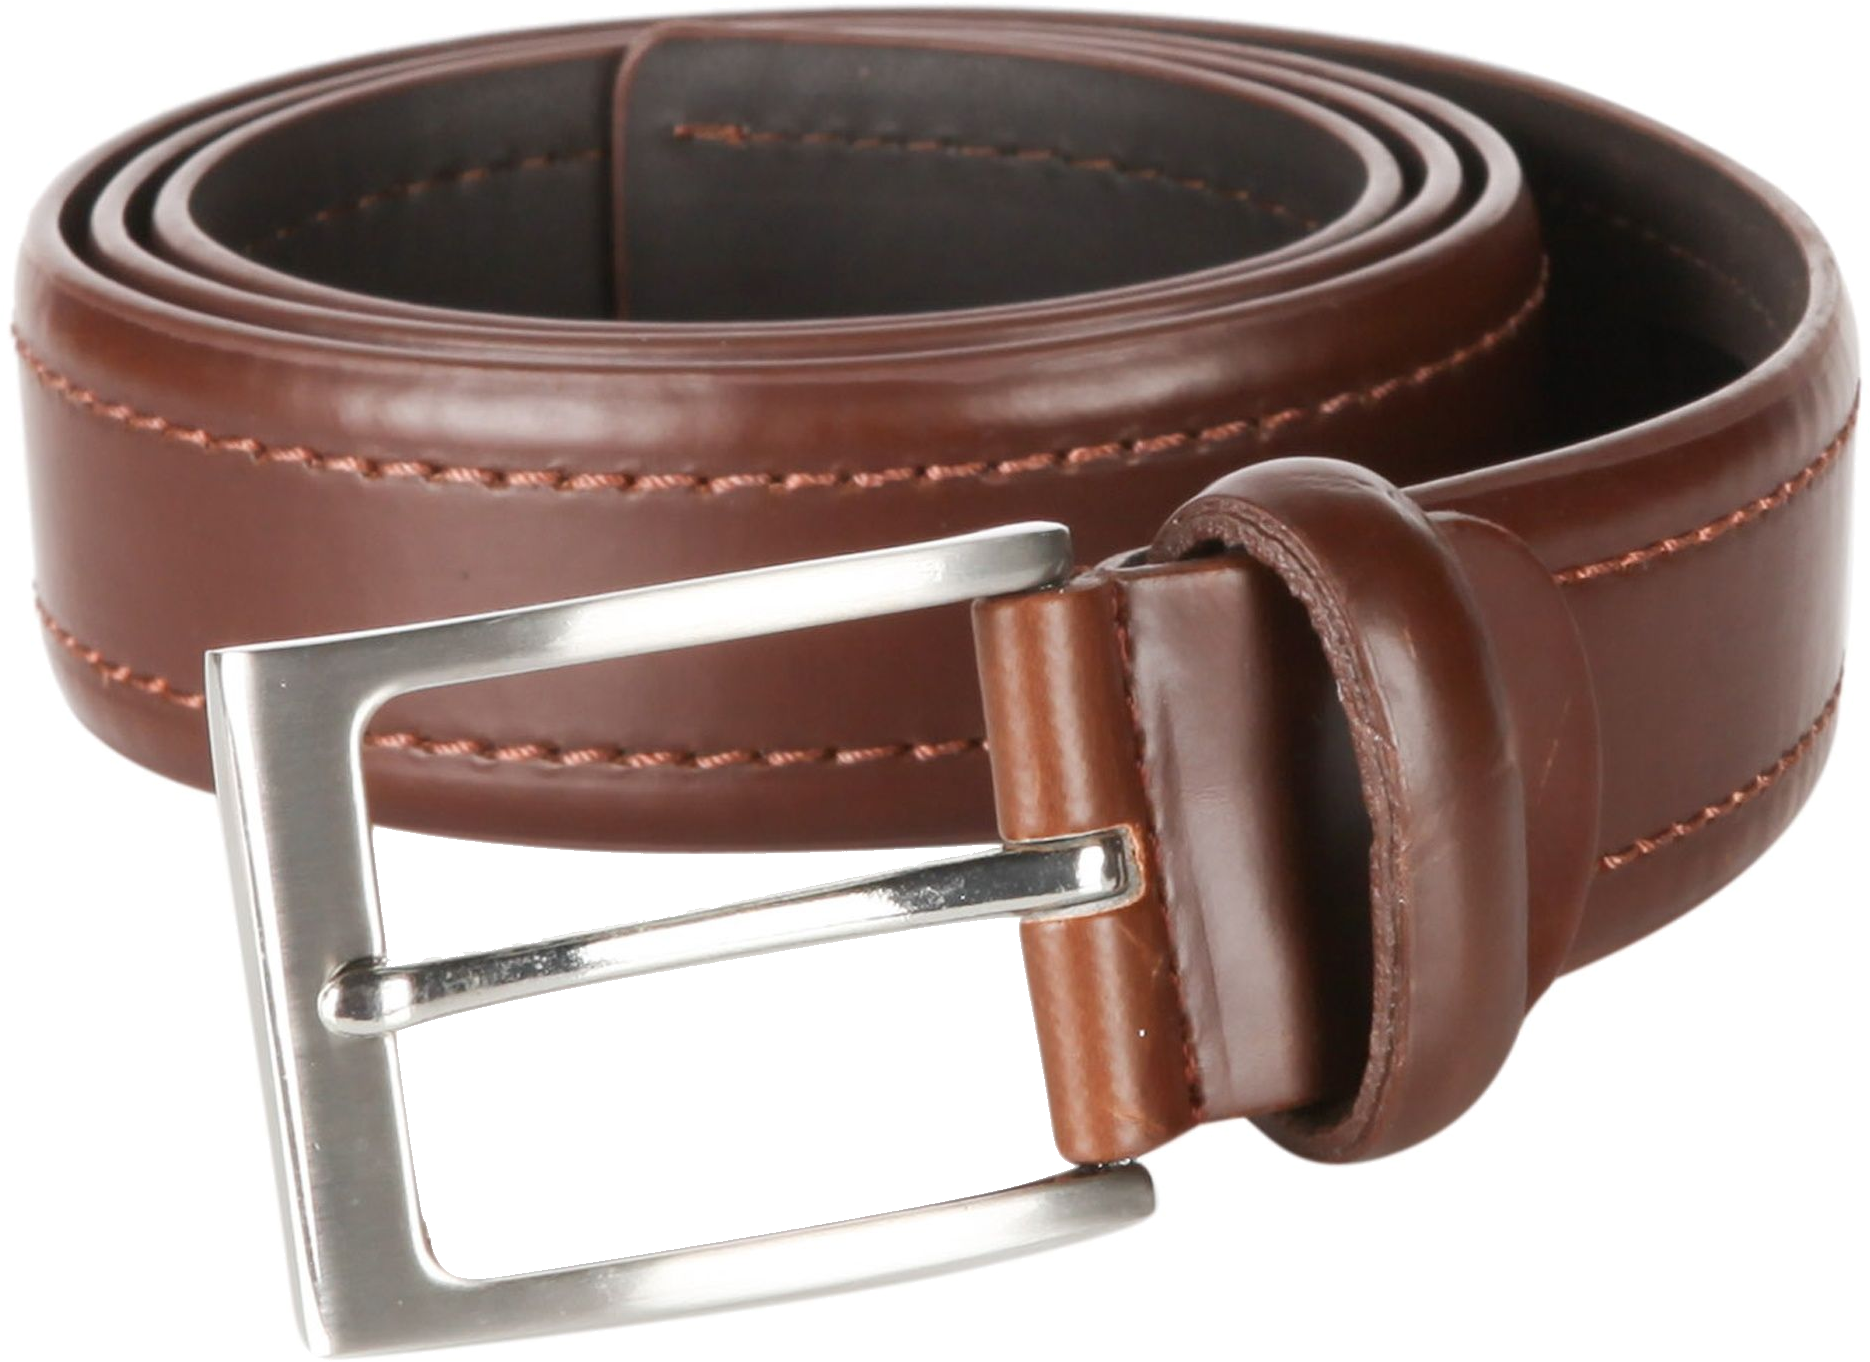 jpg transparent stock Belt clipart leather strap. Png image purepng free.